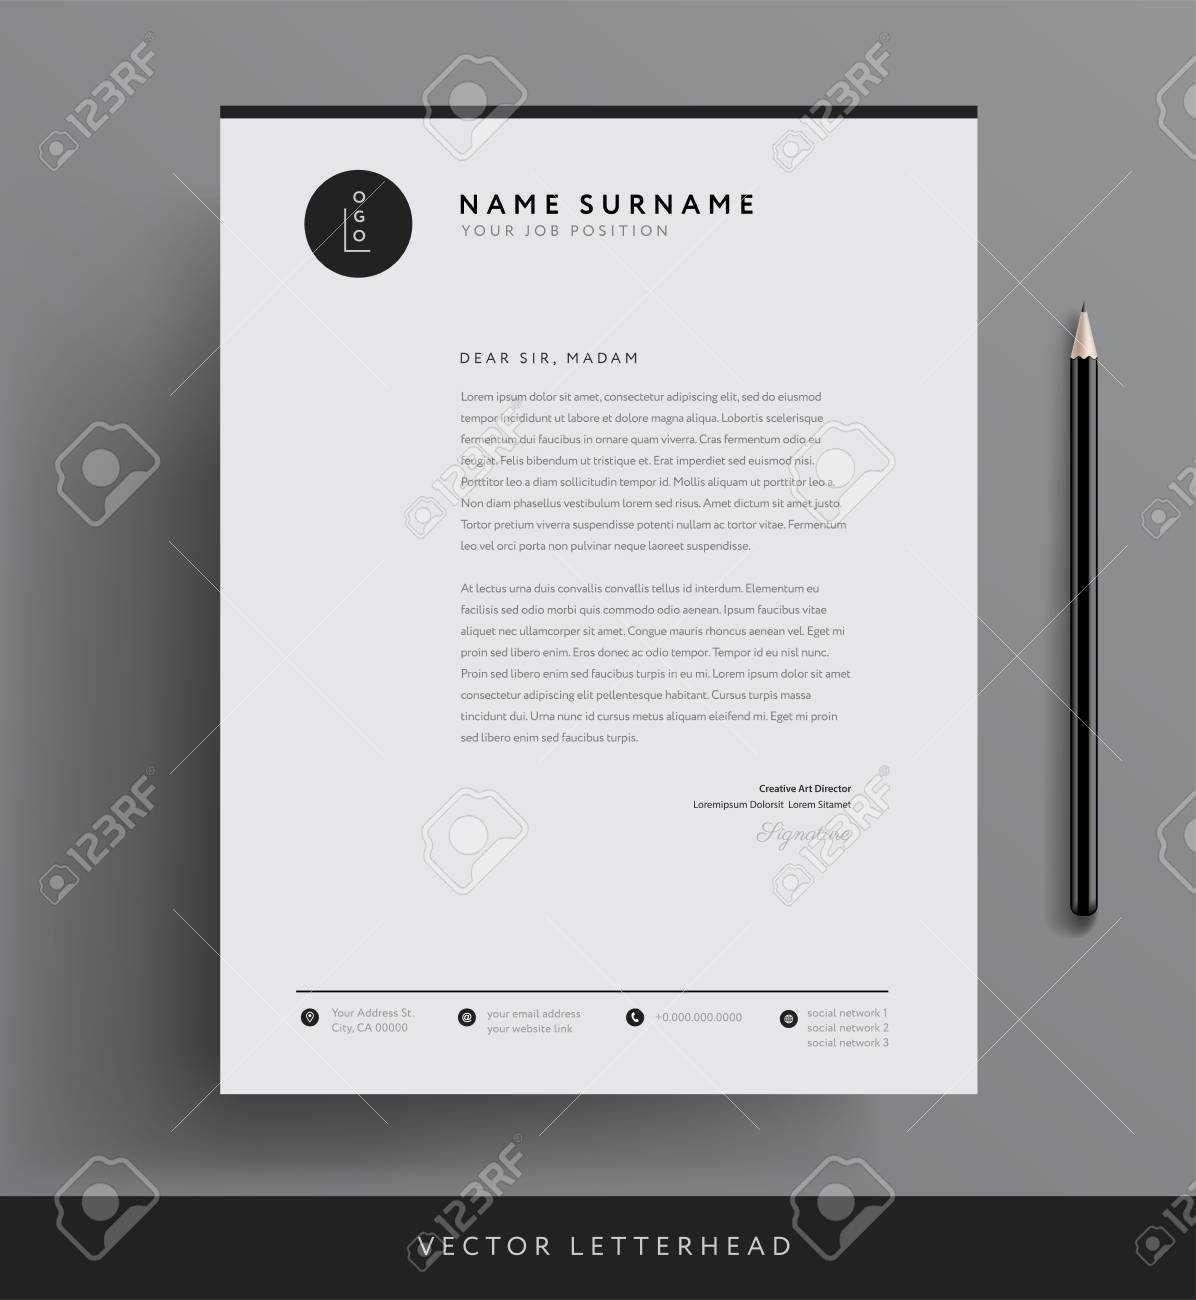 Elegant Letterhead Template Design With Elegant Letterhead Template